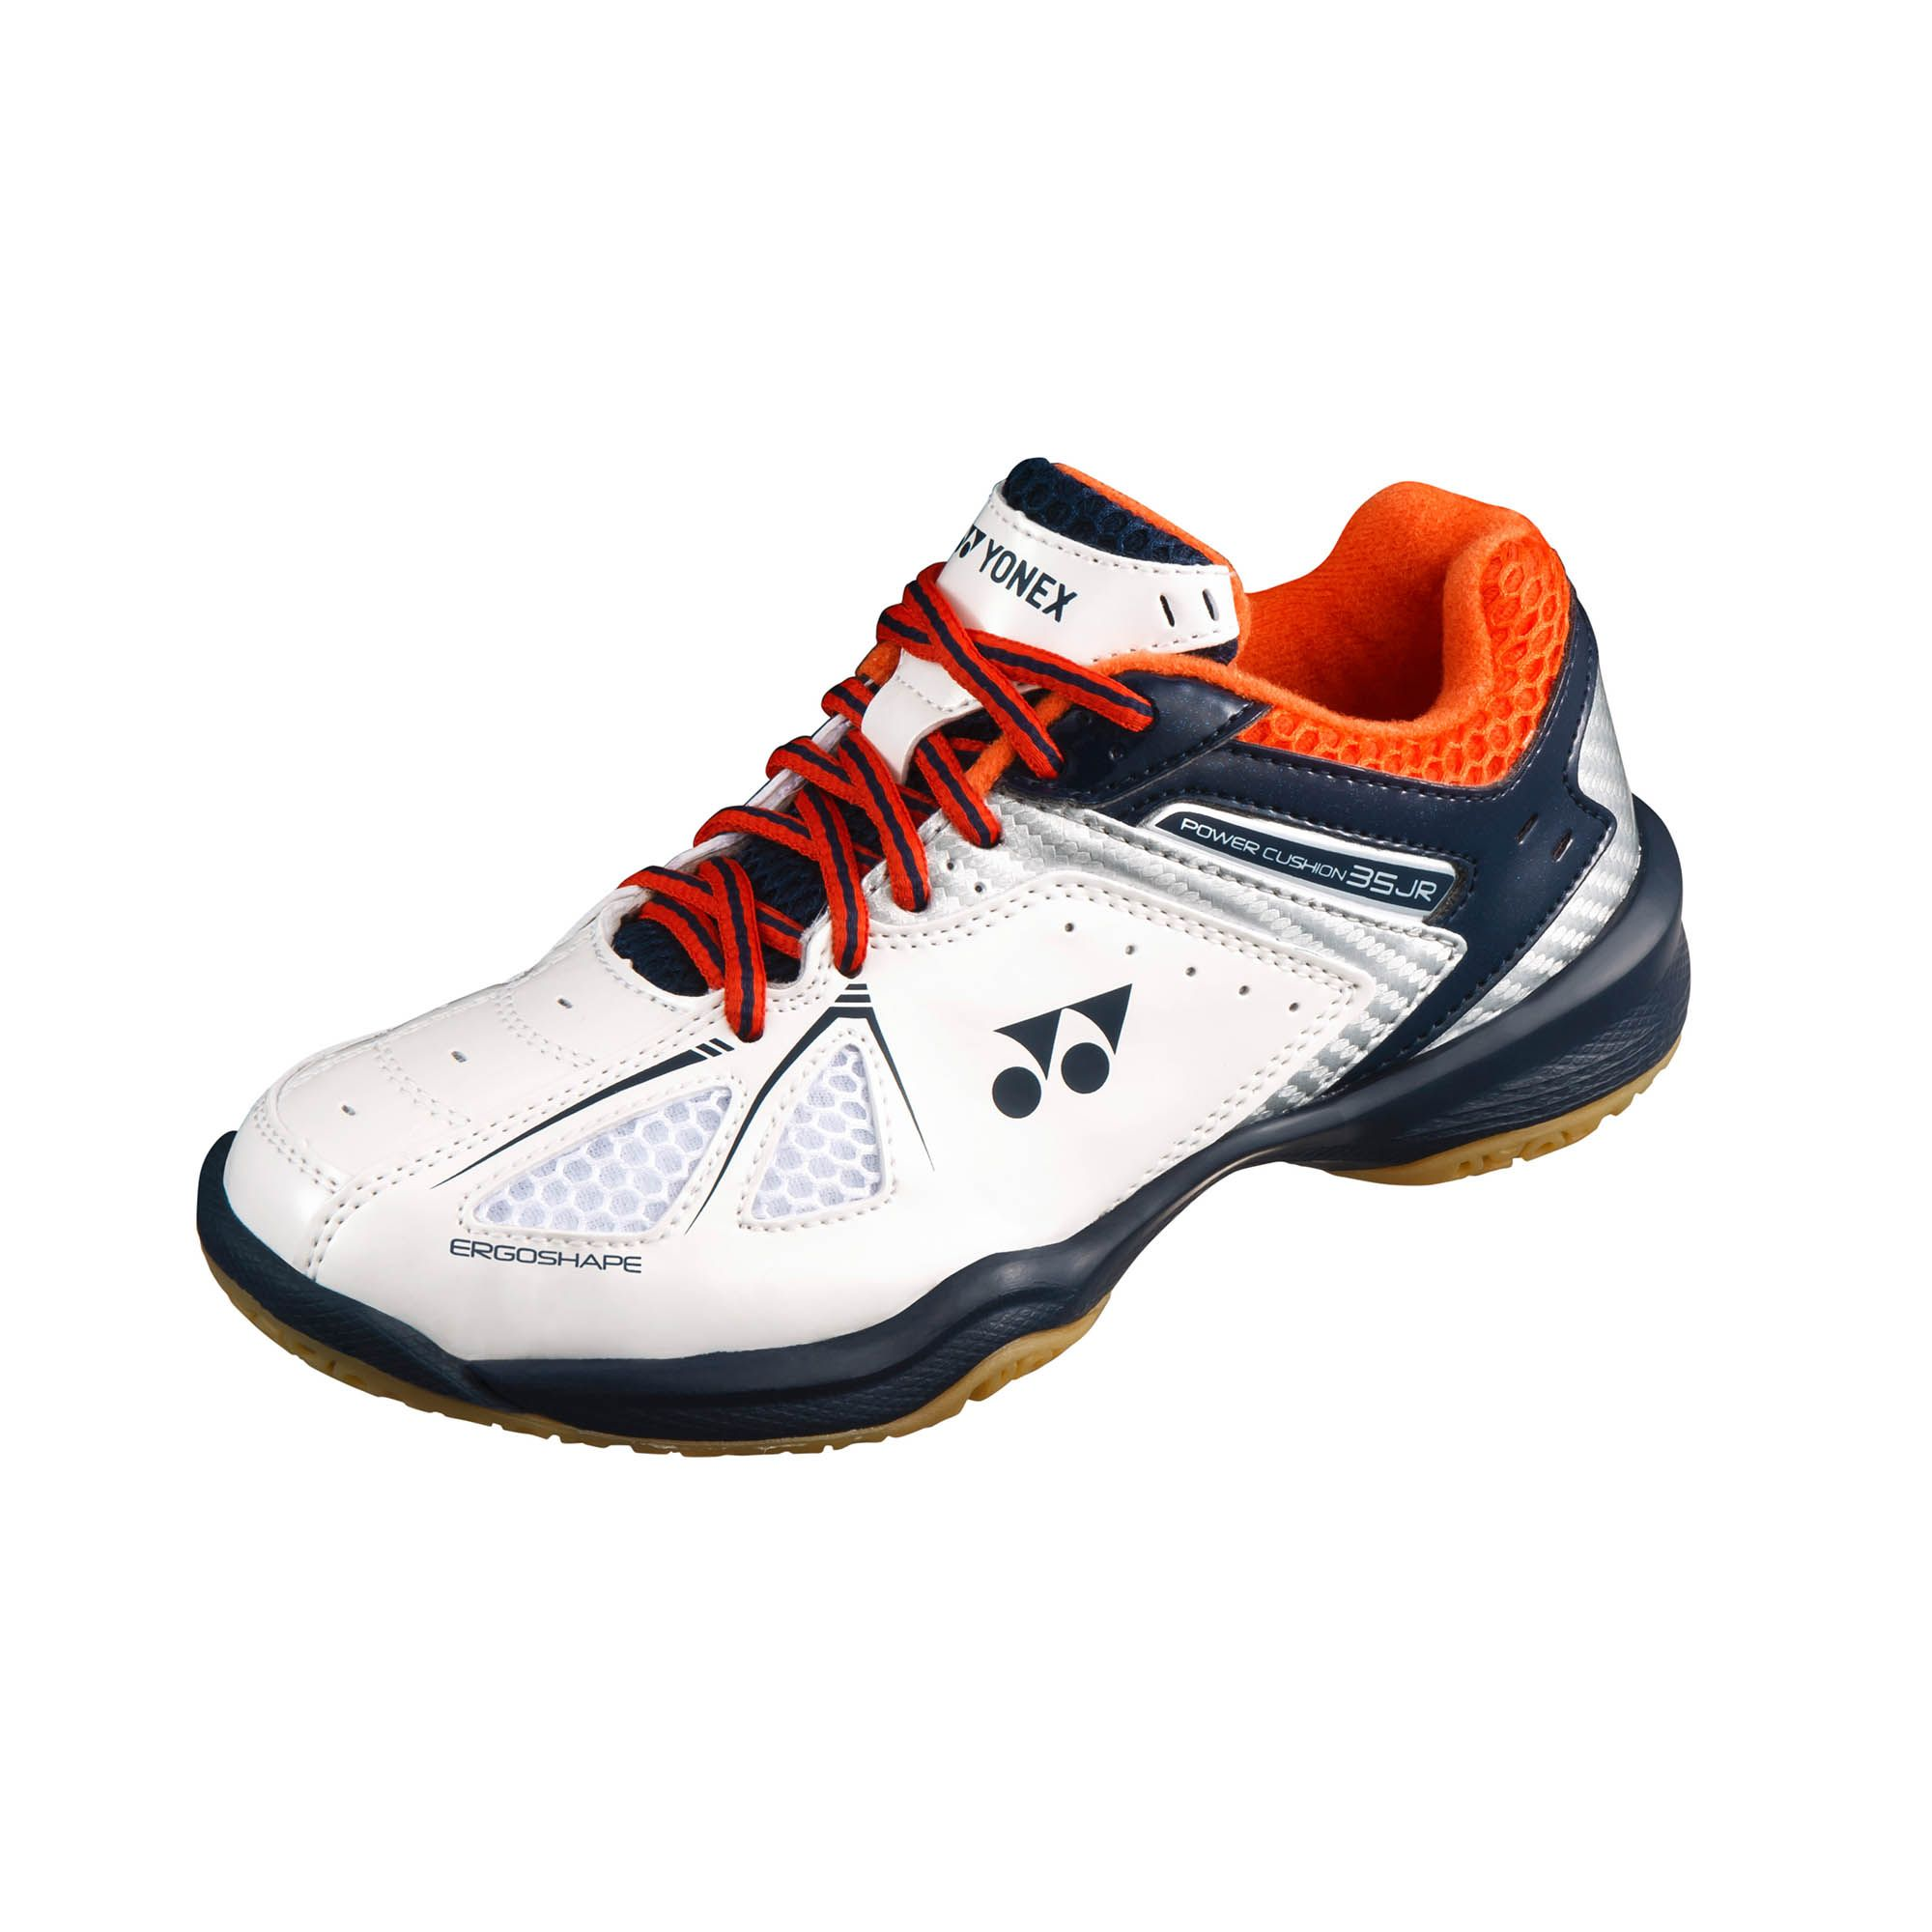 Head Revolt Team Mens Tennis Shoes - Sweatband.com